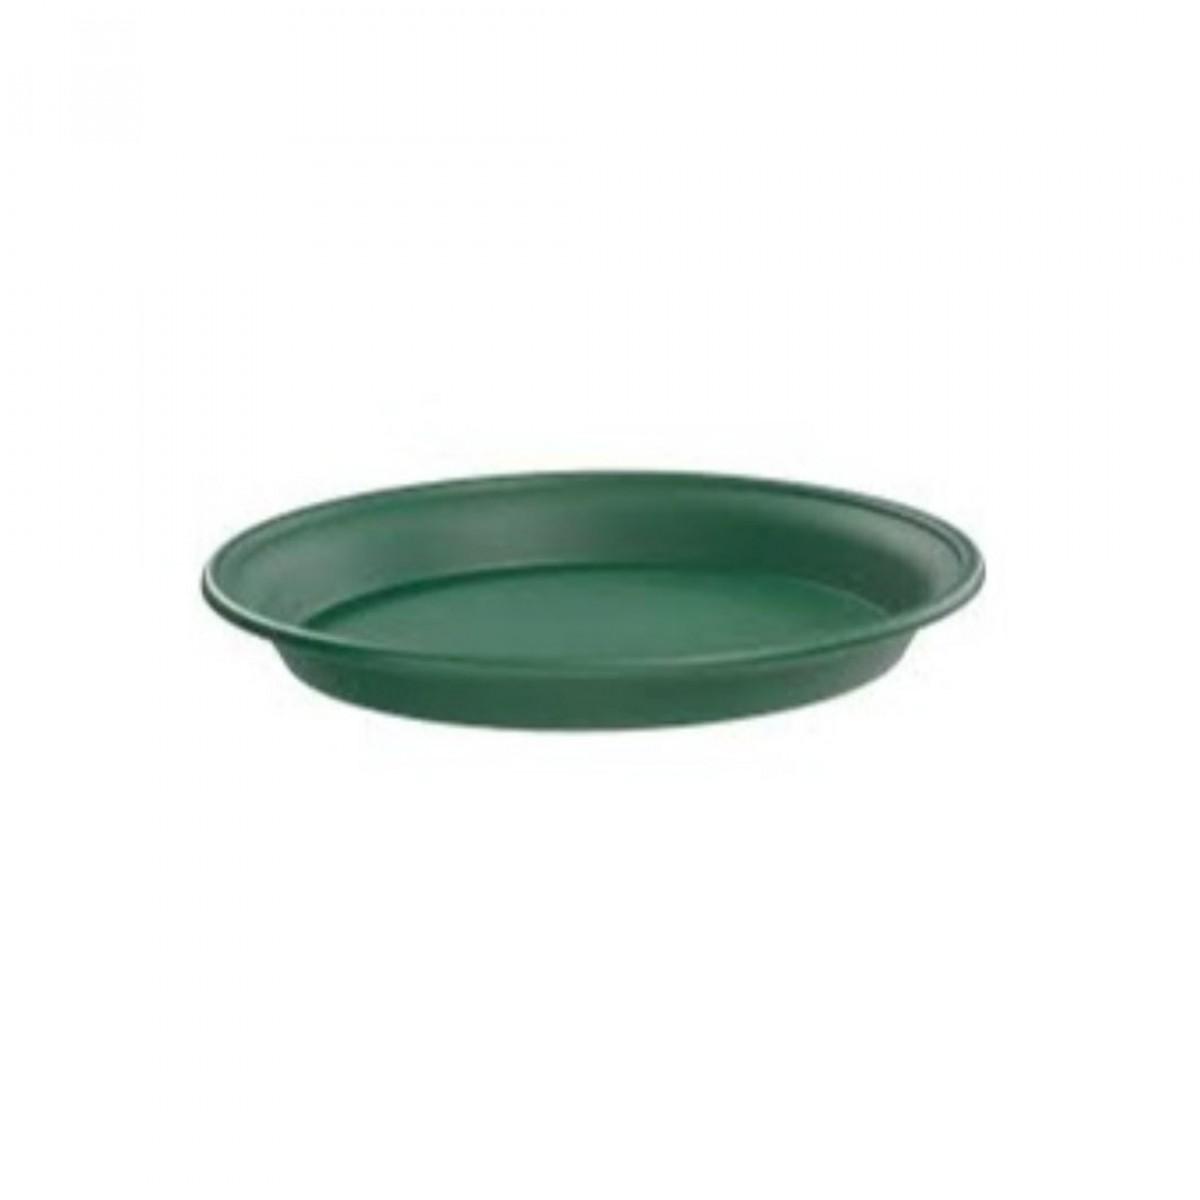 22CM Plastic Tray Green - 10 No